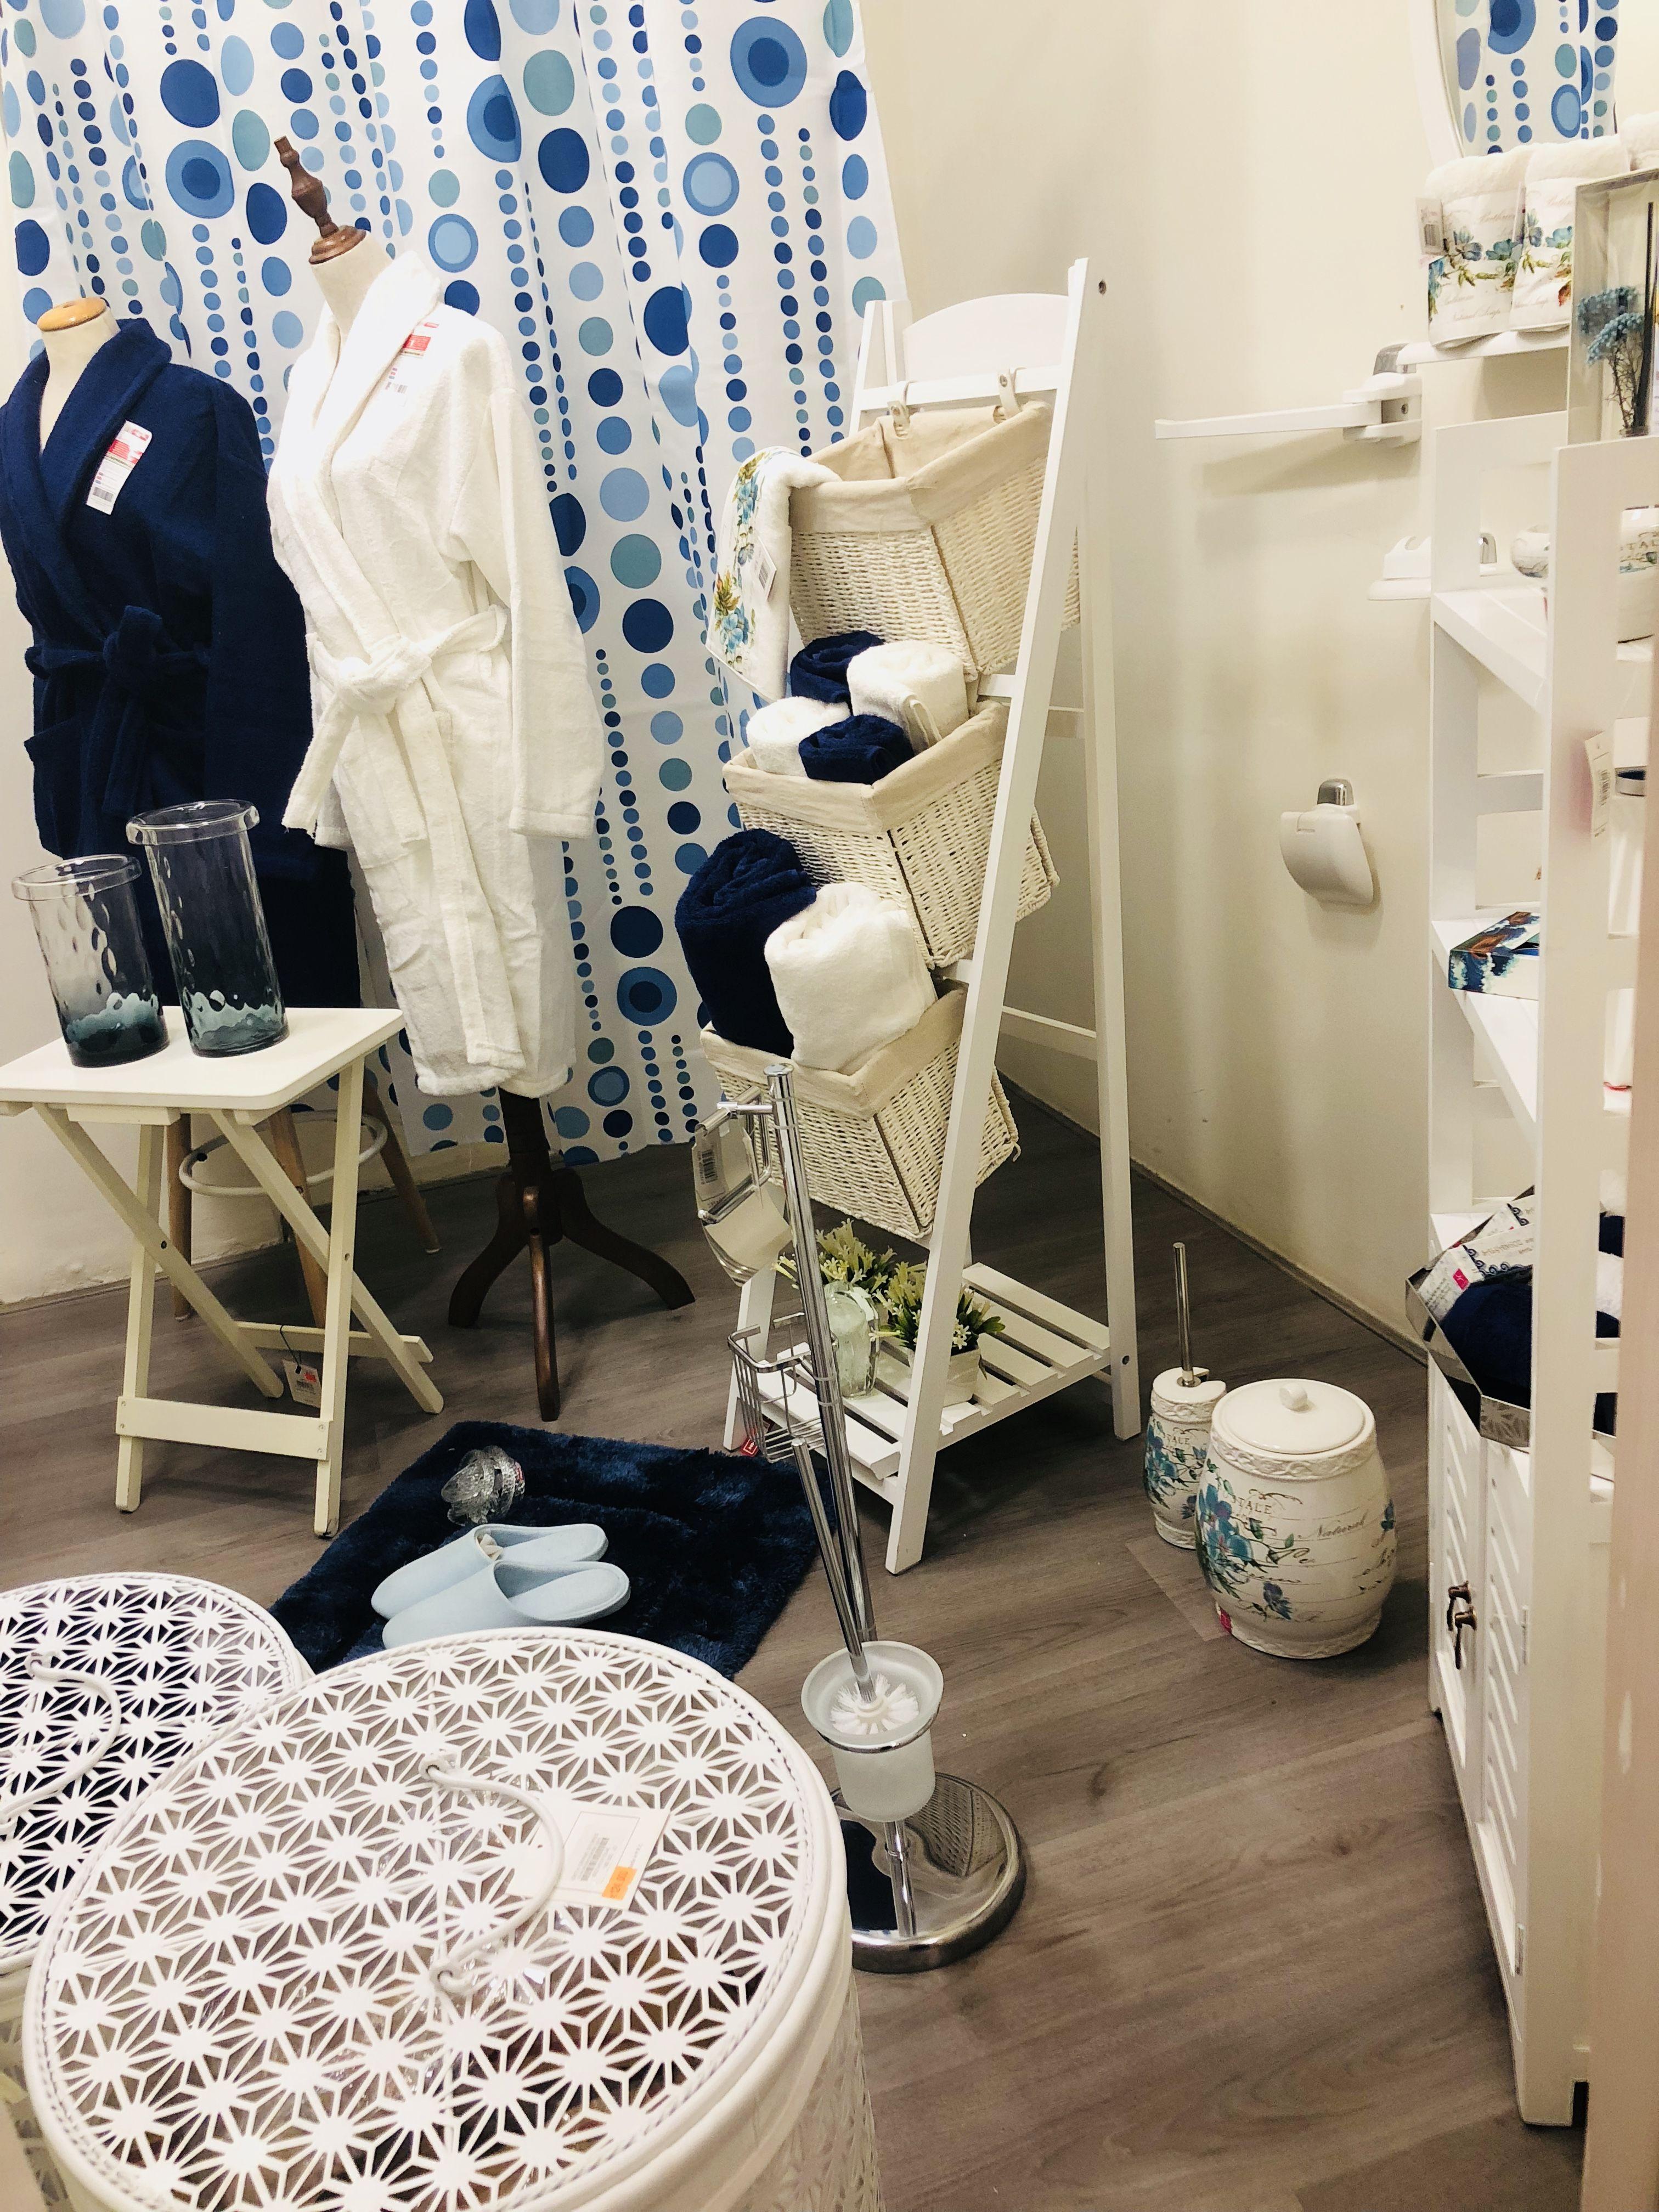 Bath Accessories And Linens Bath Accessories Shopping Linen